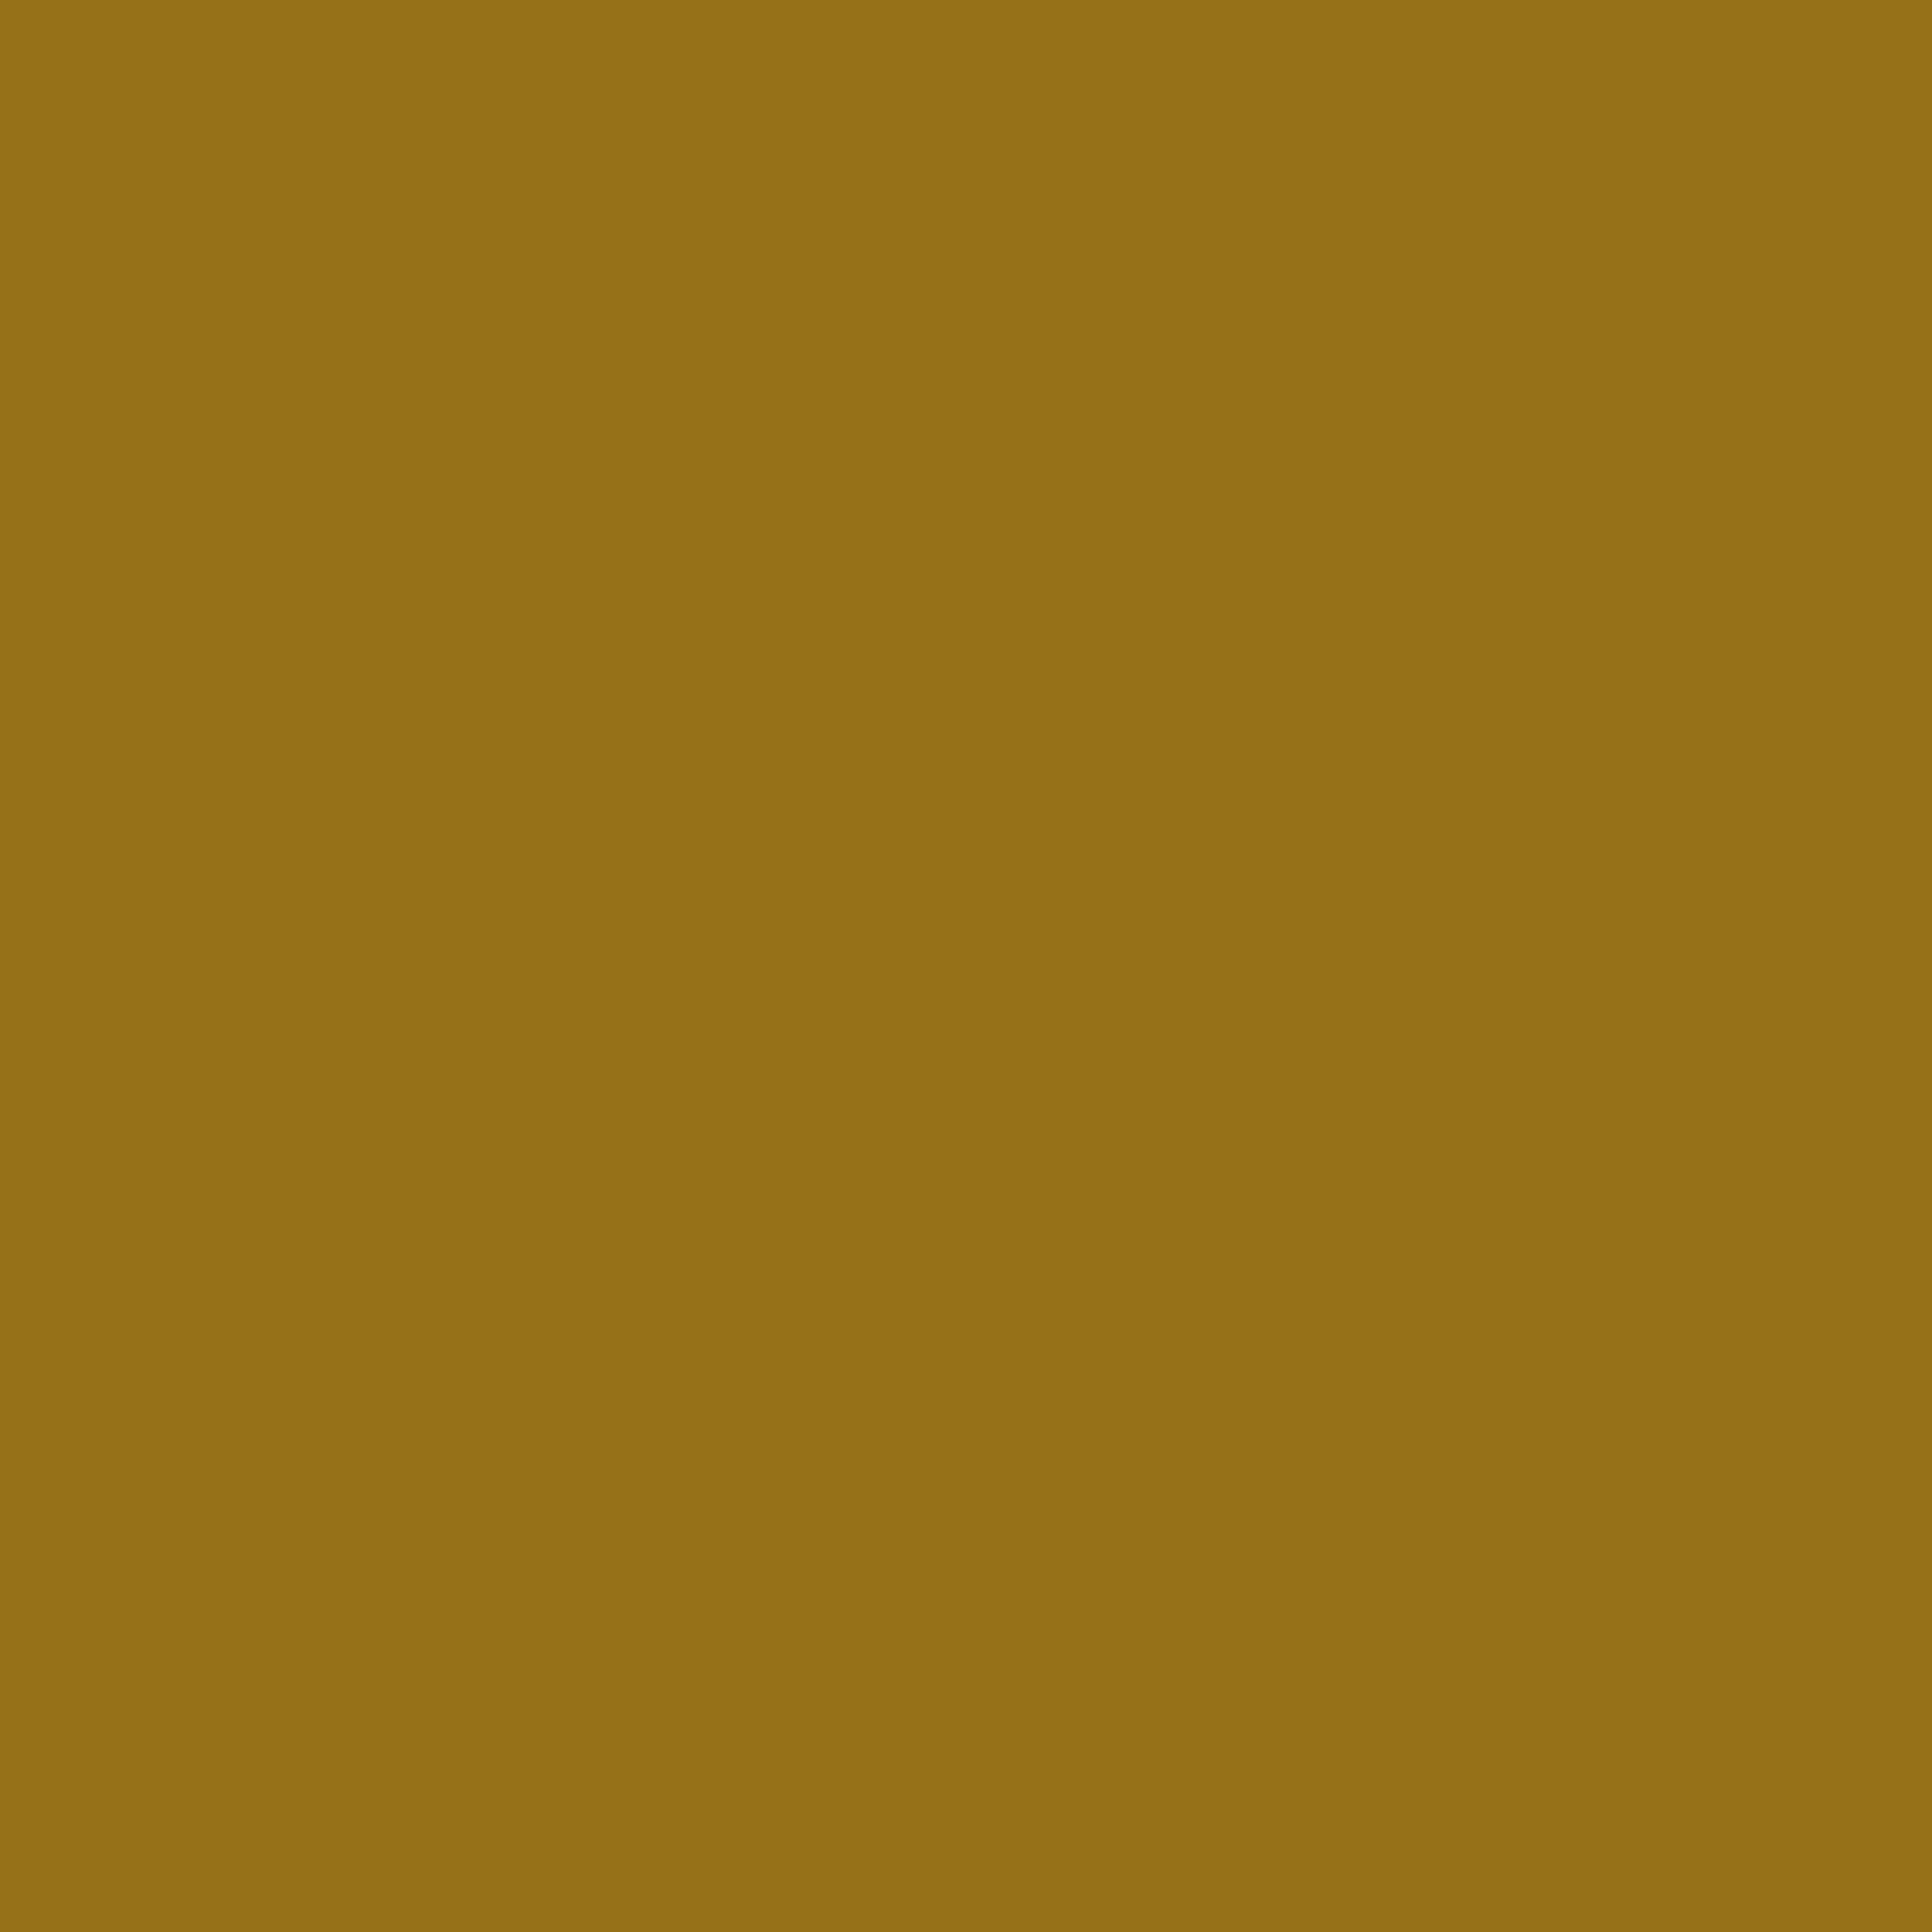 2048x2048 Bistre Brown Solid Color Background